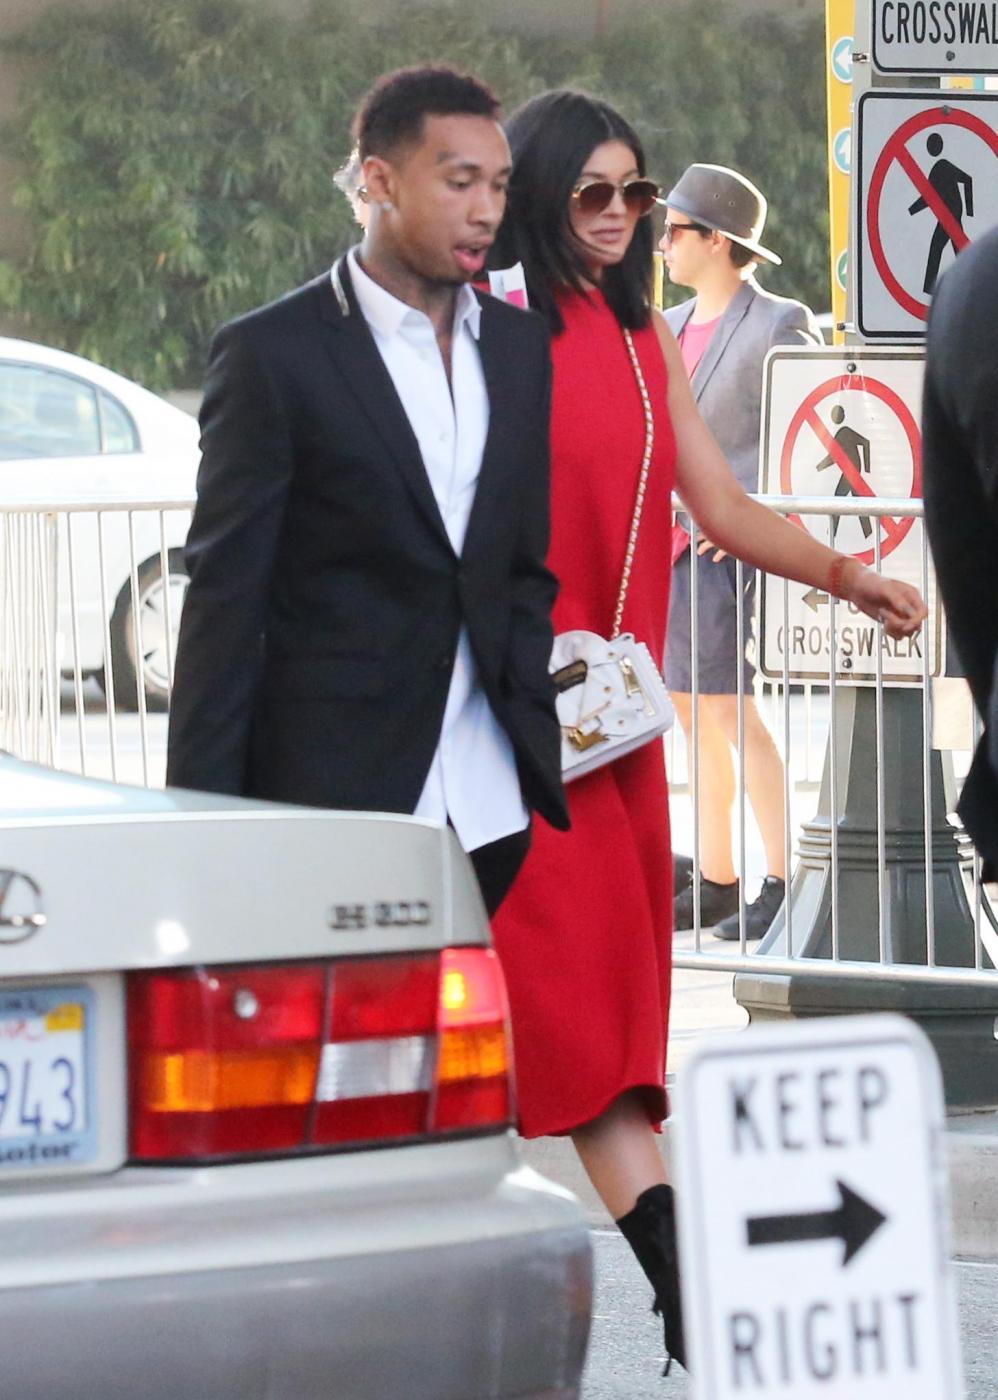 Kylie Jenner insieme al fidanzato Tyga FOTO 5